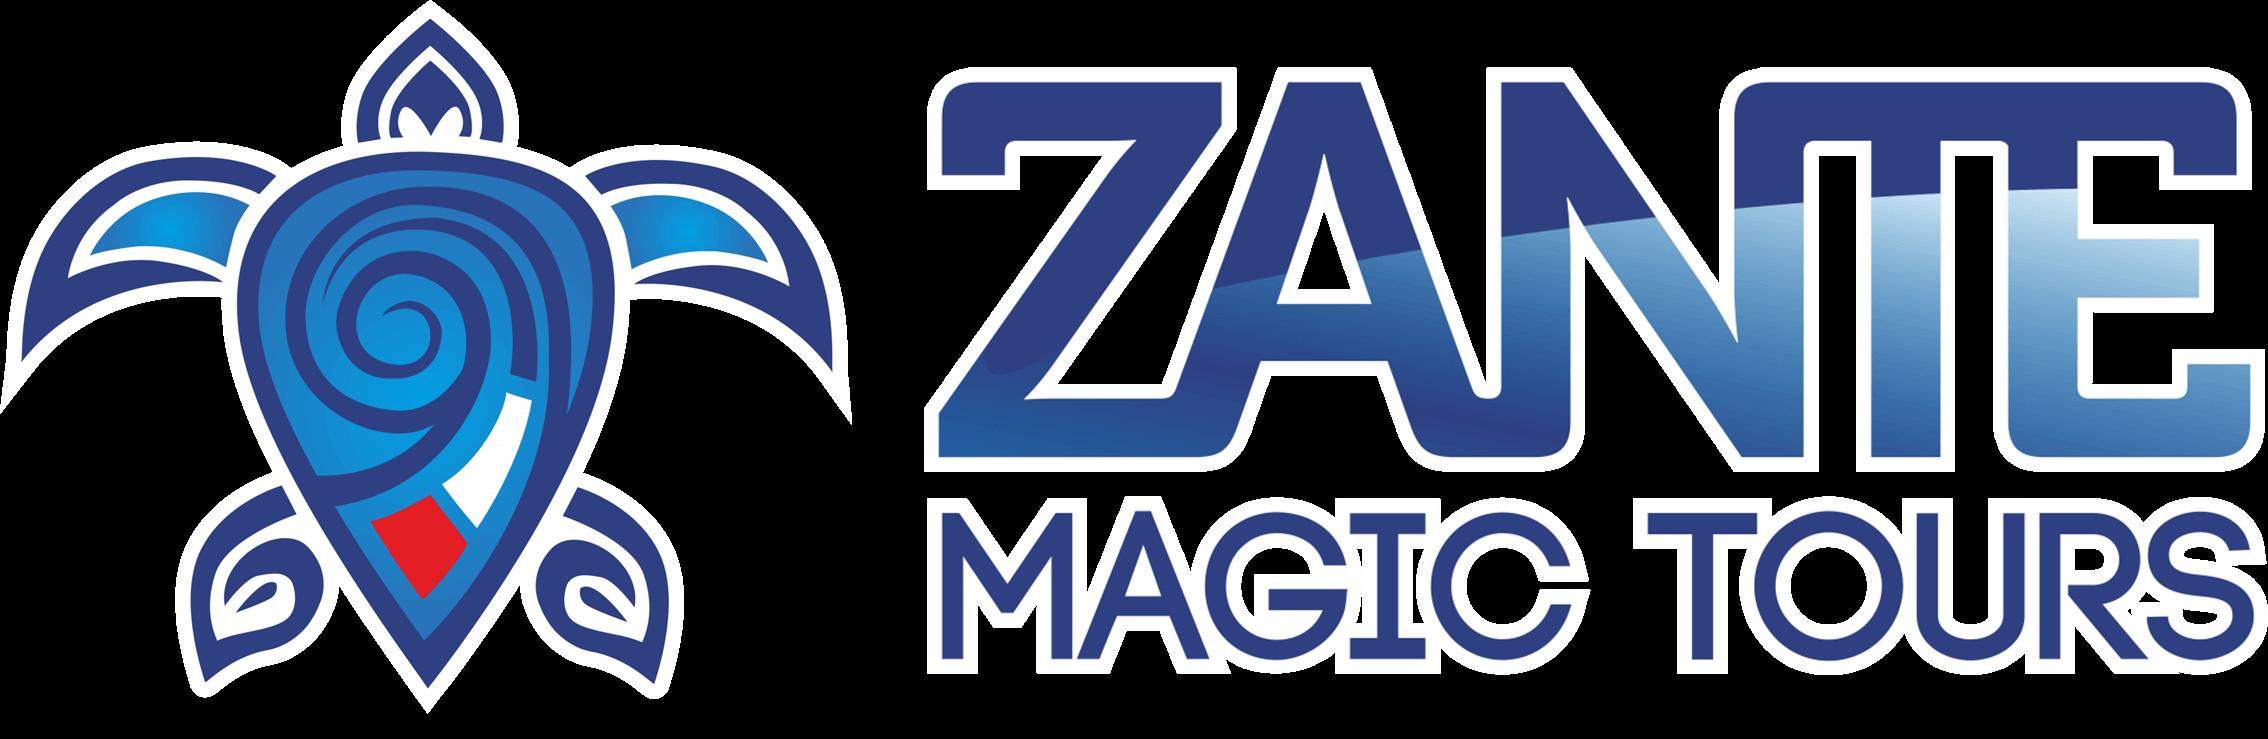 Zante Magic Tours